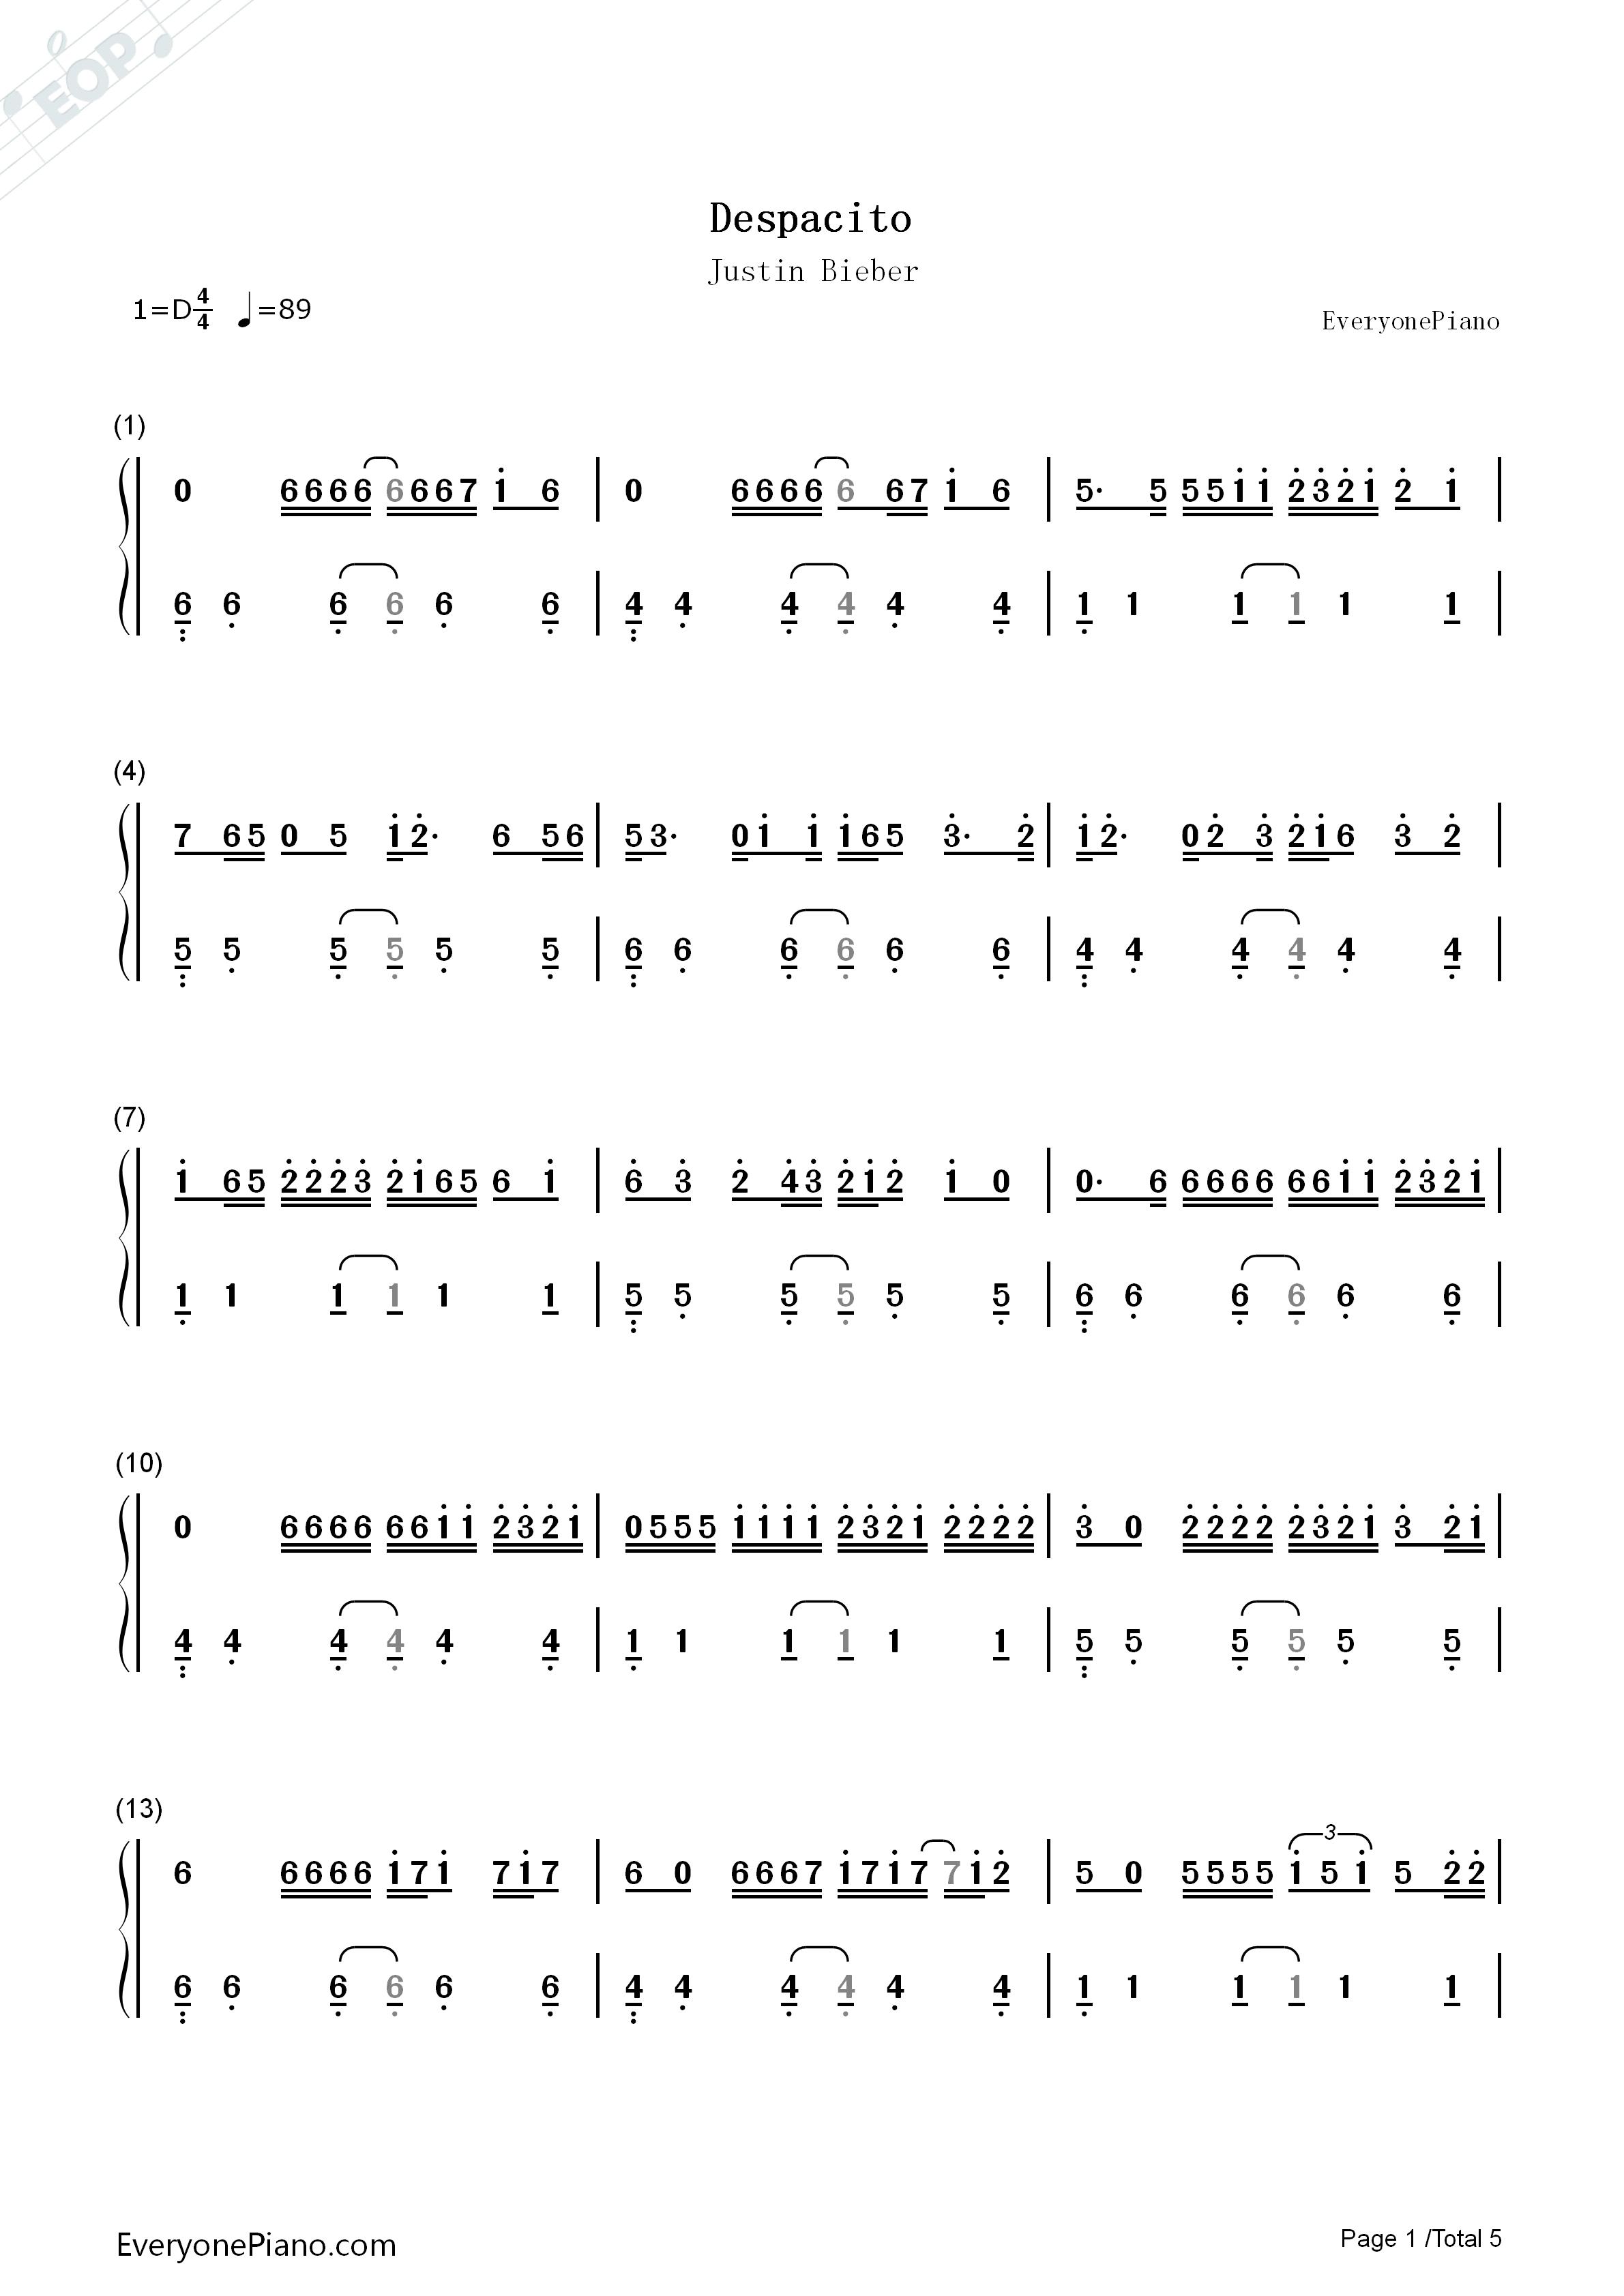 despacito-justin bieber双手简谱预览